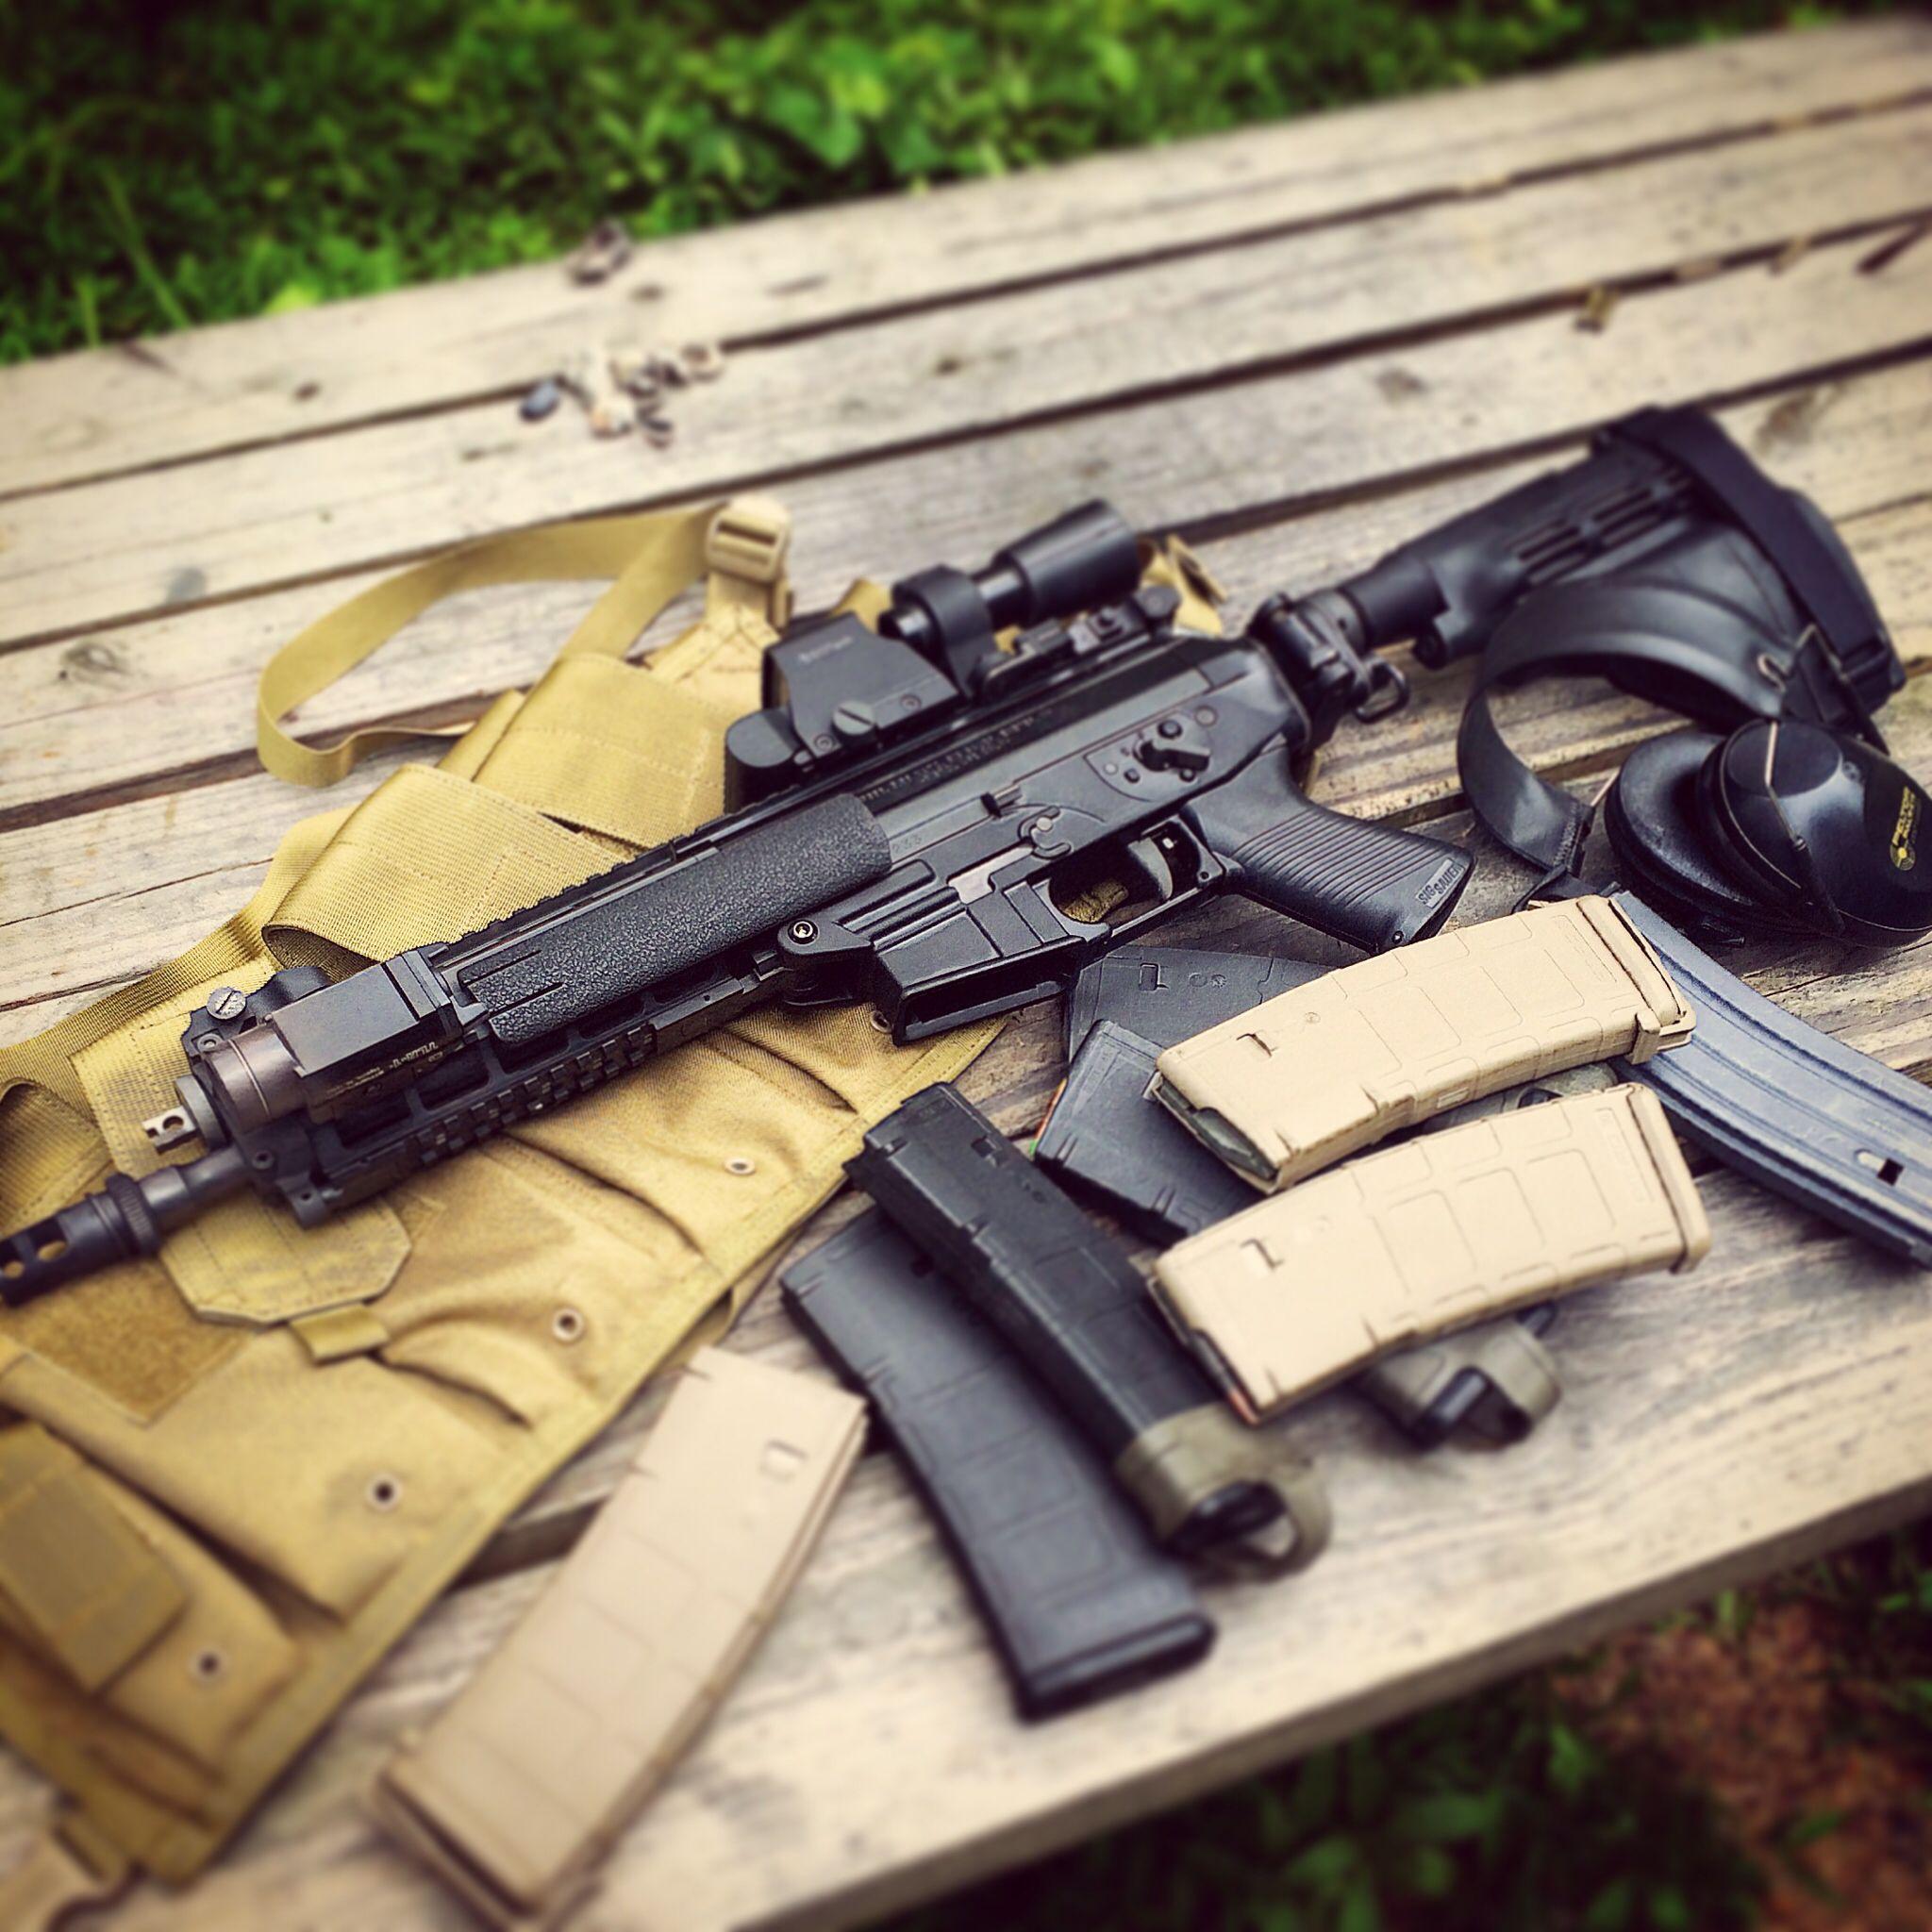 Sig Sauer P556 Quad Rail SWAT Pistol In 556 223 With SB15 TacBrace